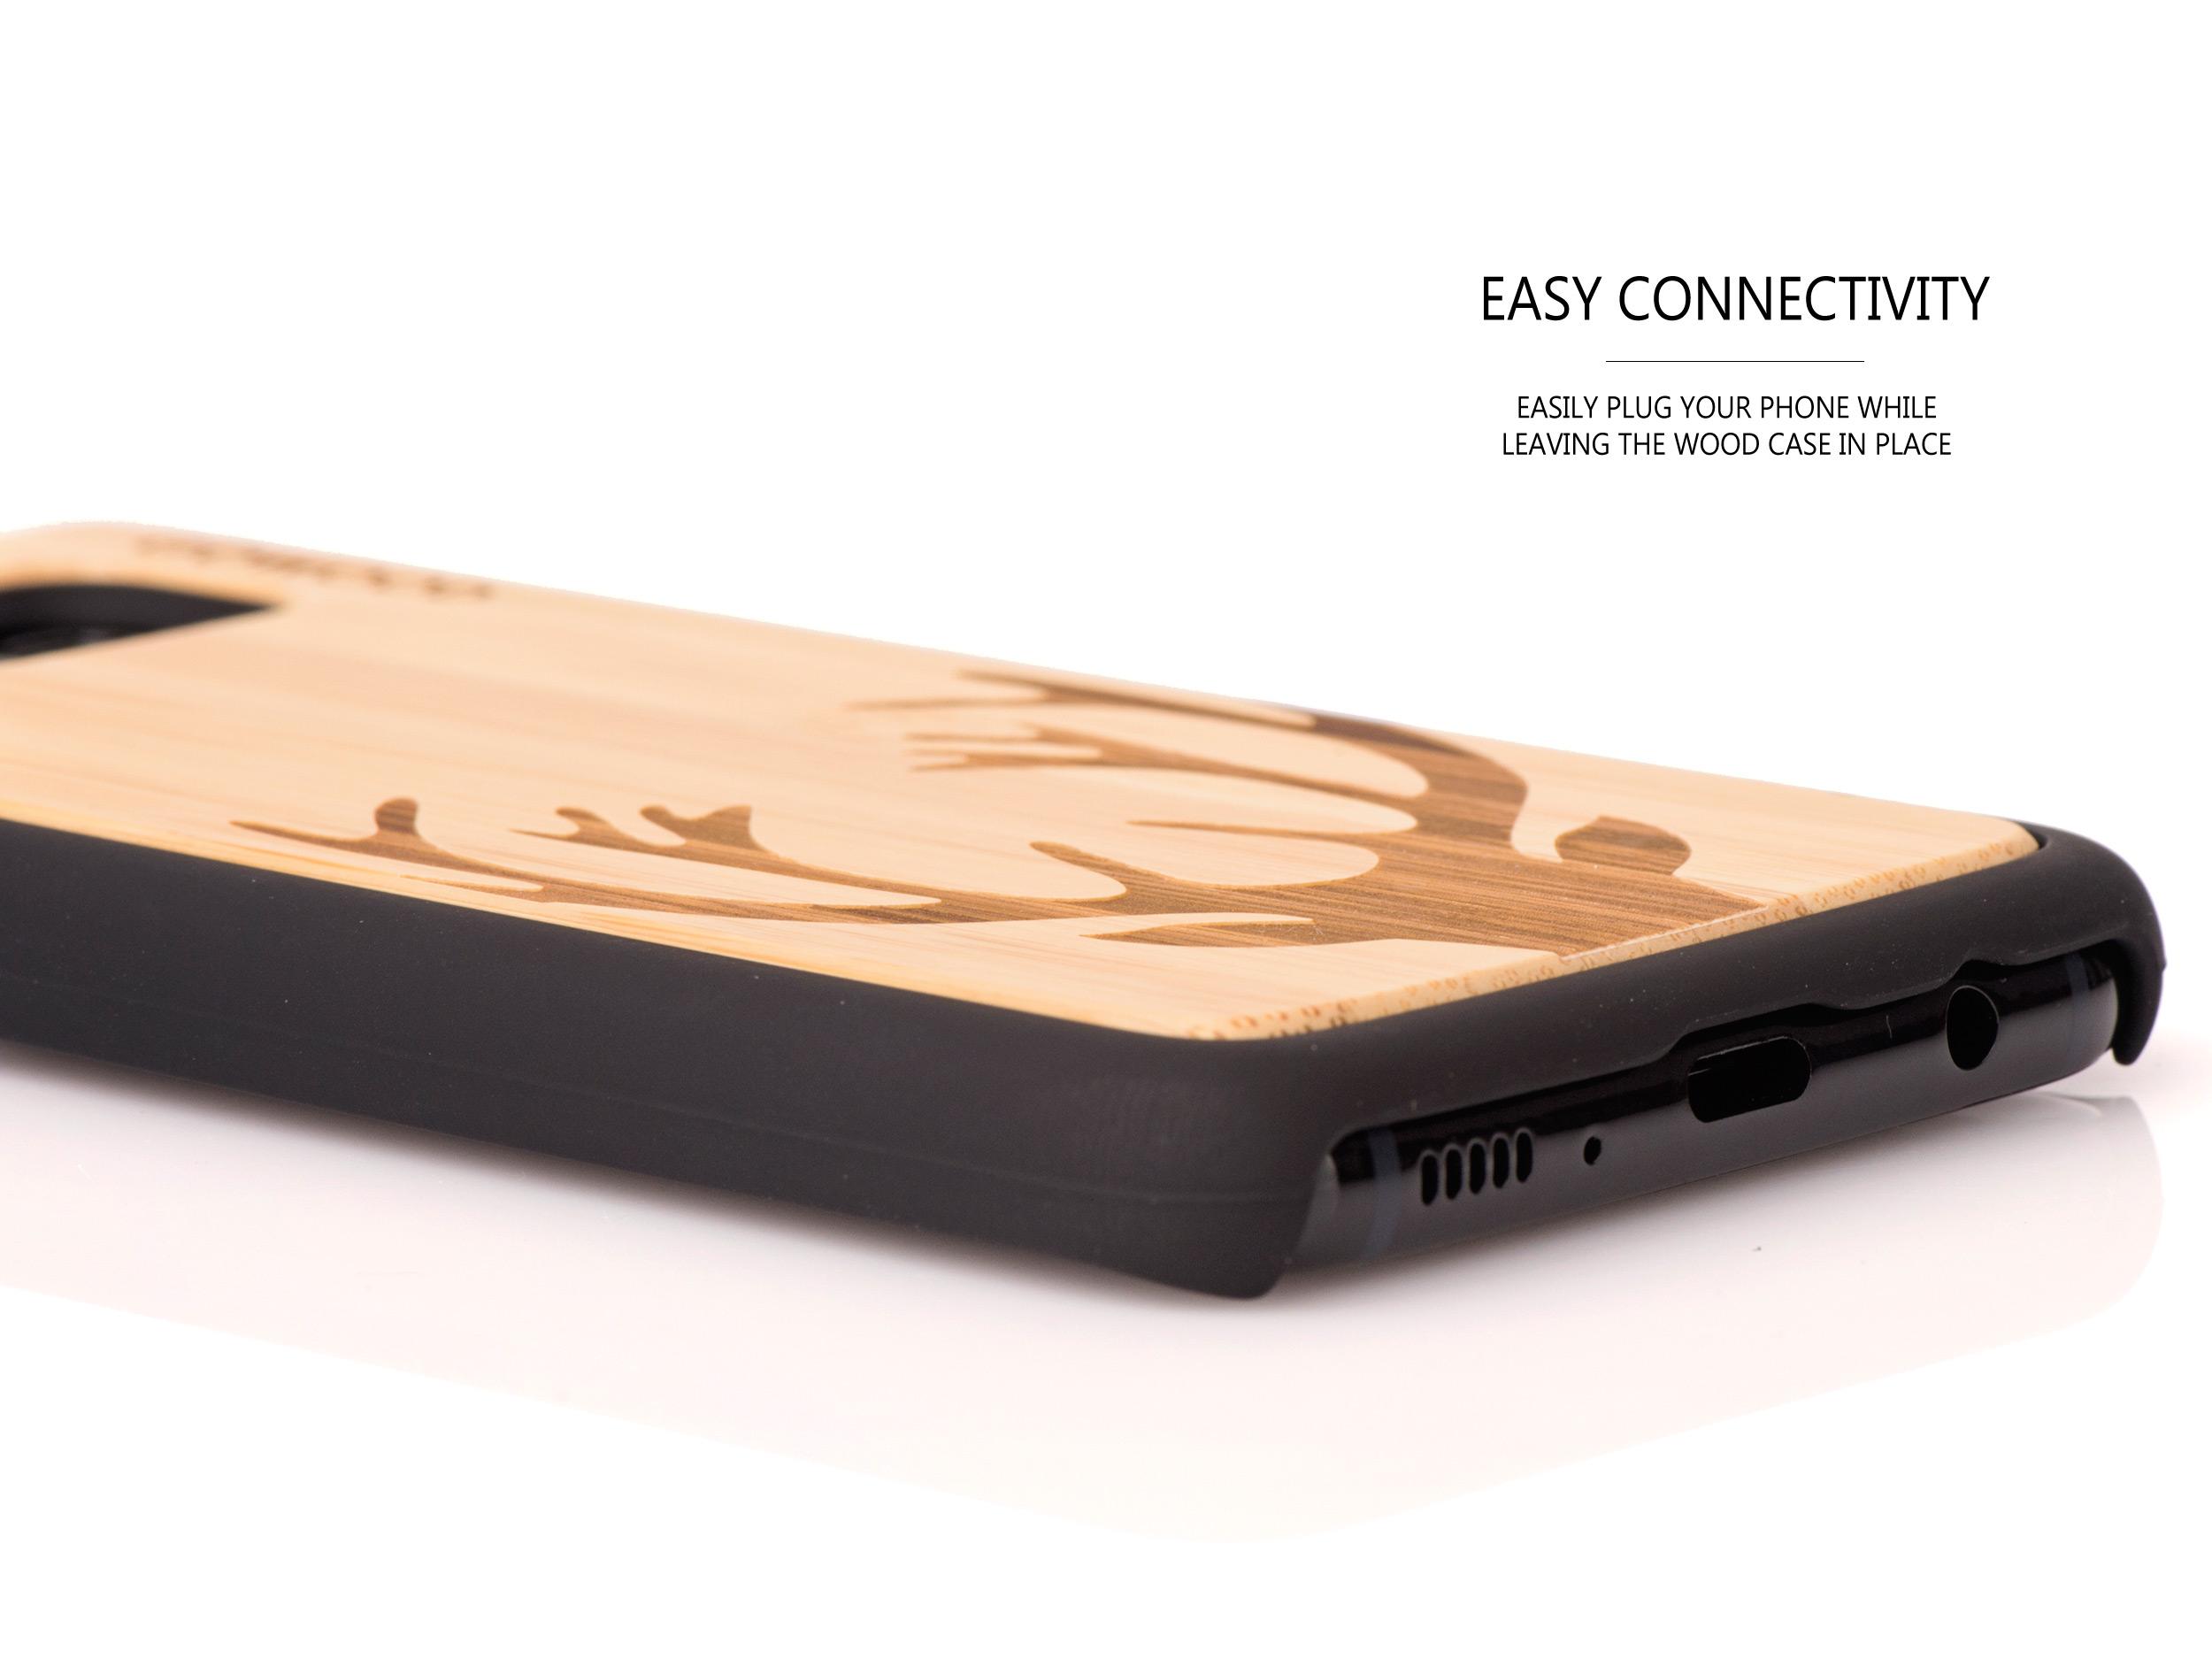 Samsung Galaxy S8 wood case - socket